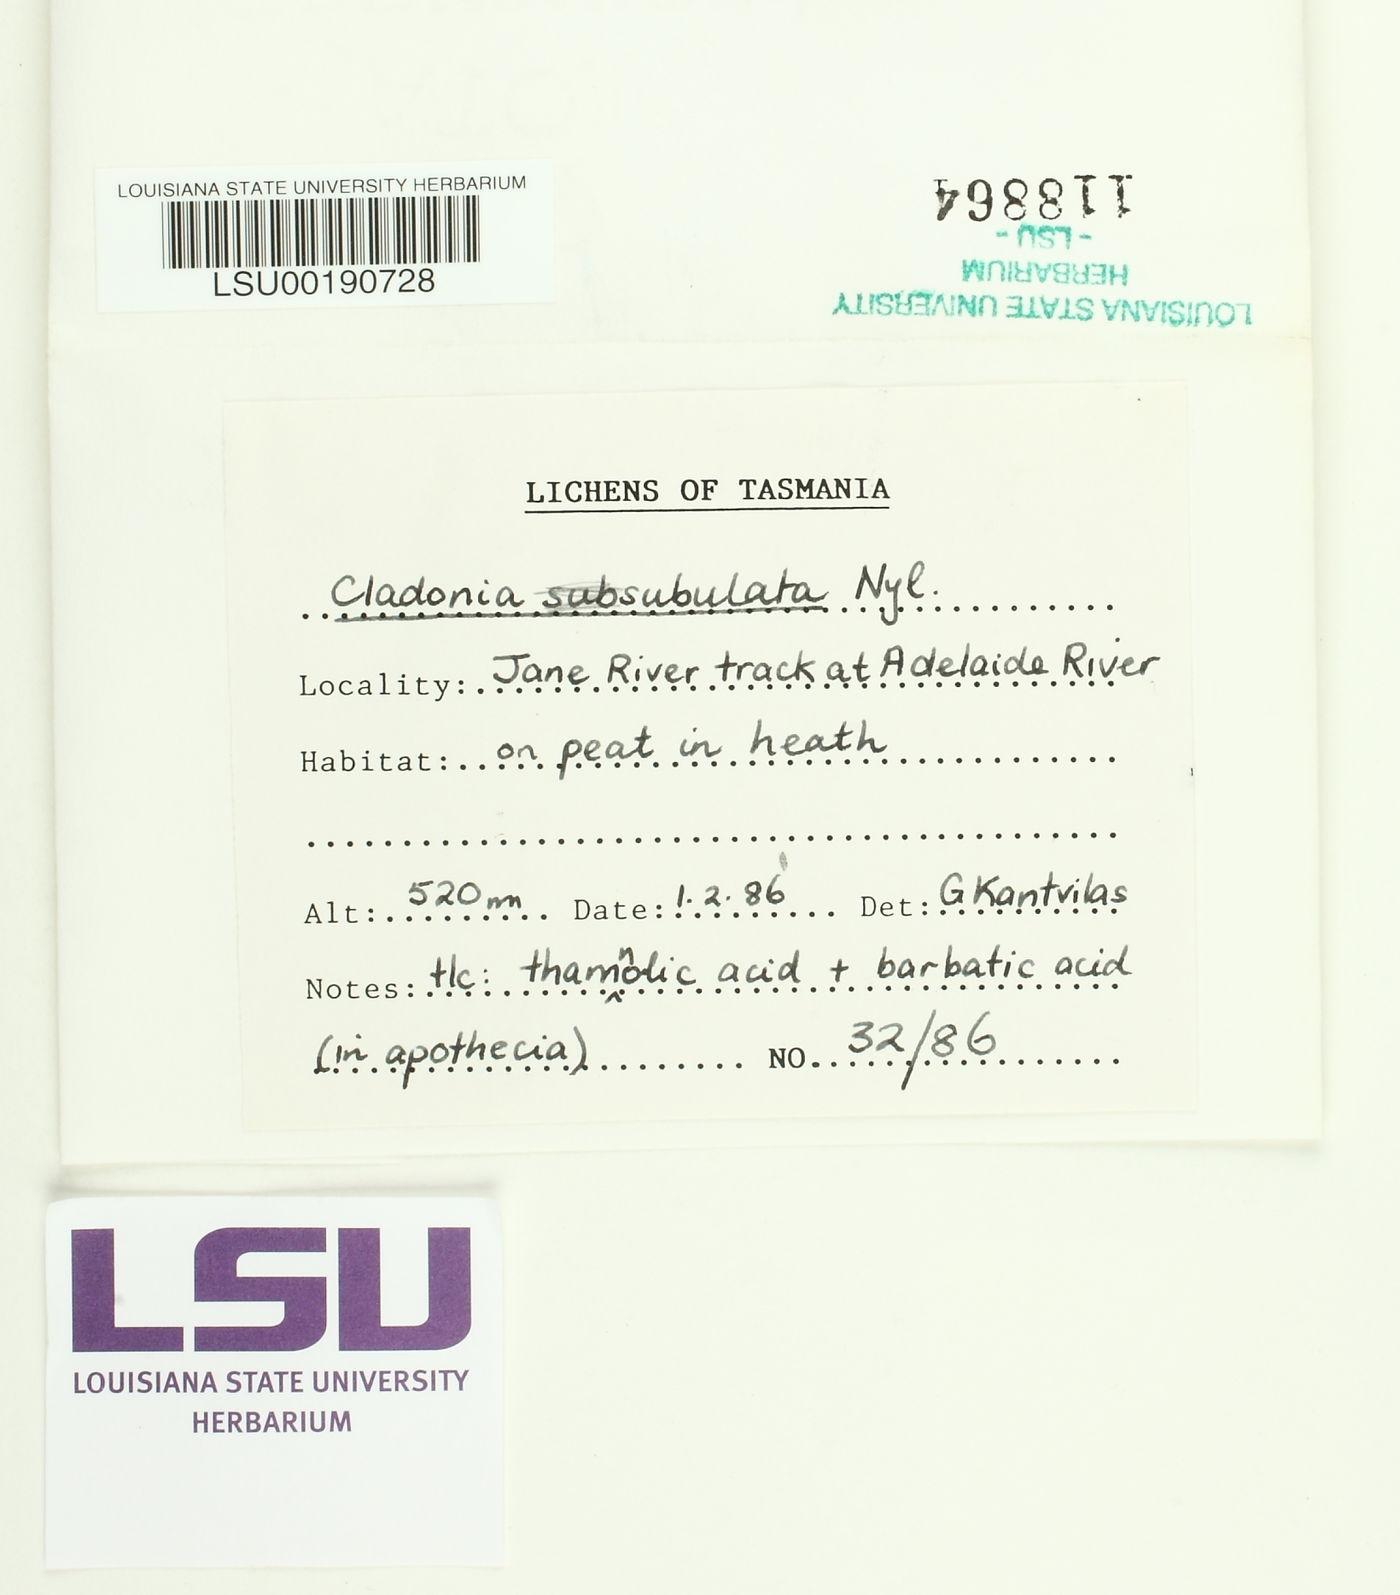 Cladonia subsubulata image